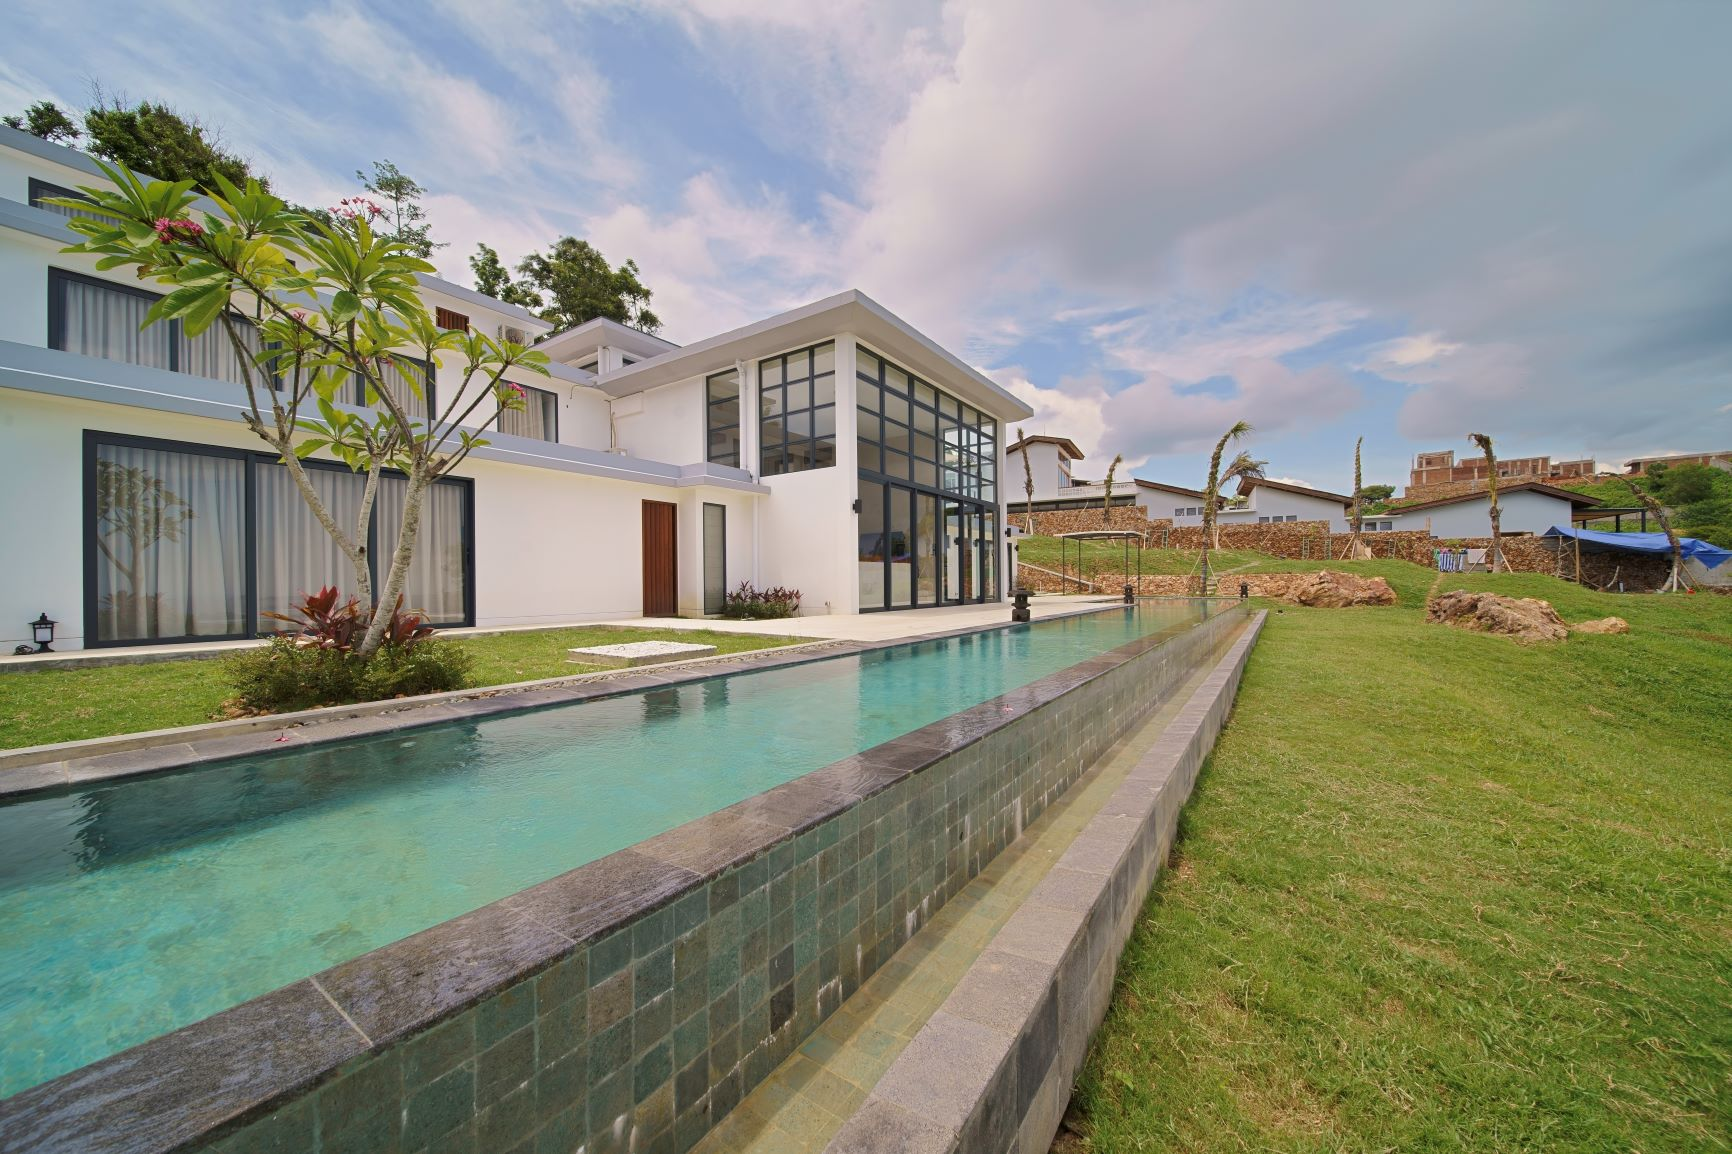 Nagaindo land for sale investment property Kuta Lombok Kuta Skyline villa